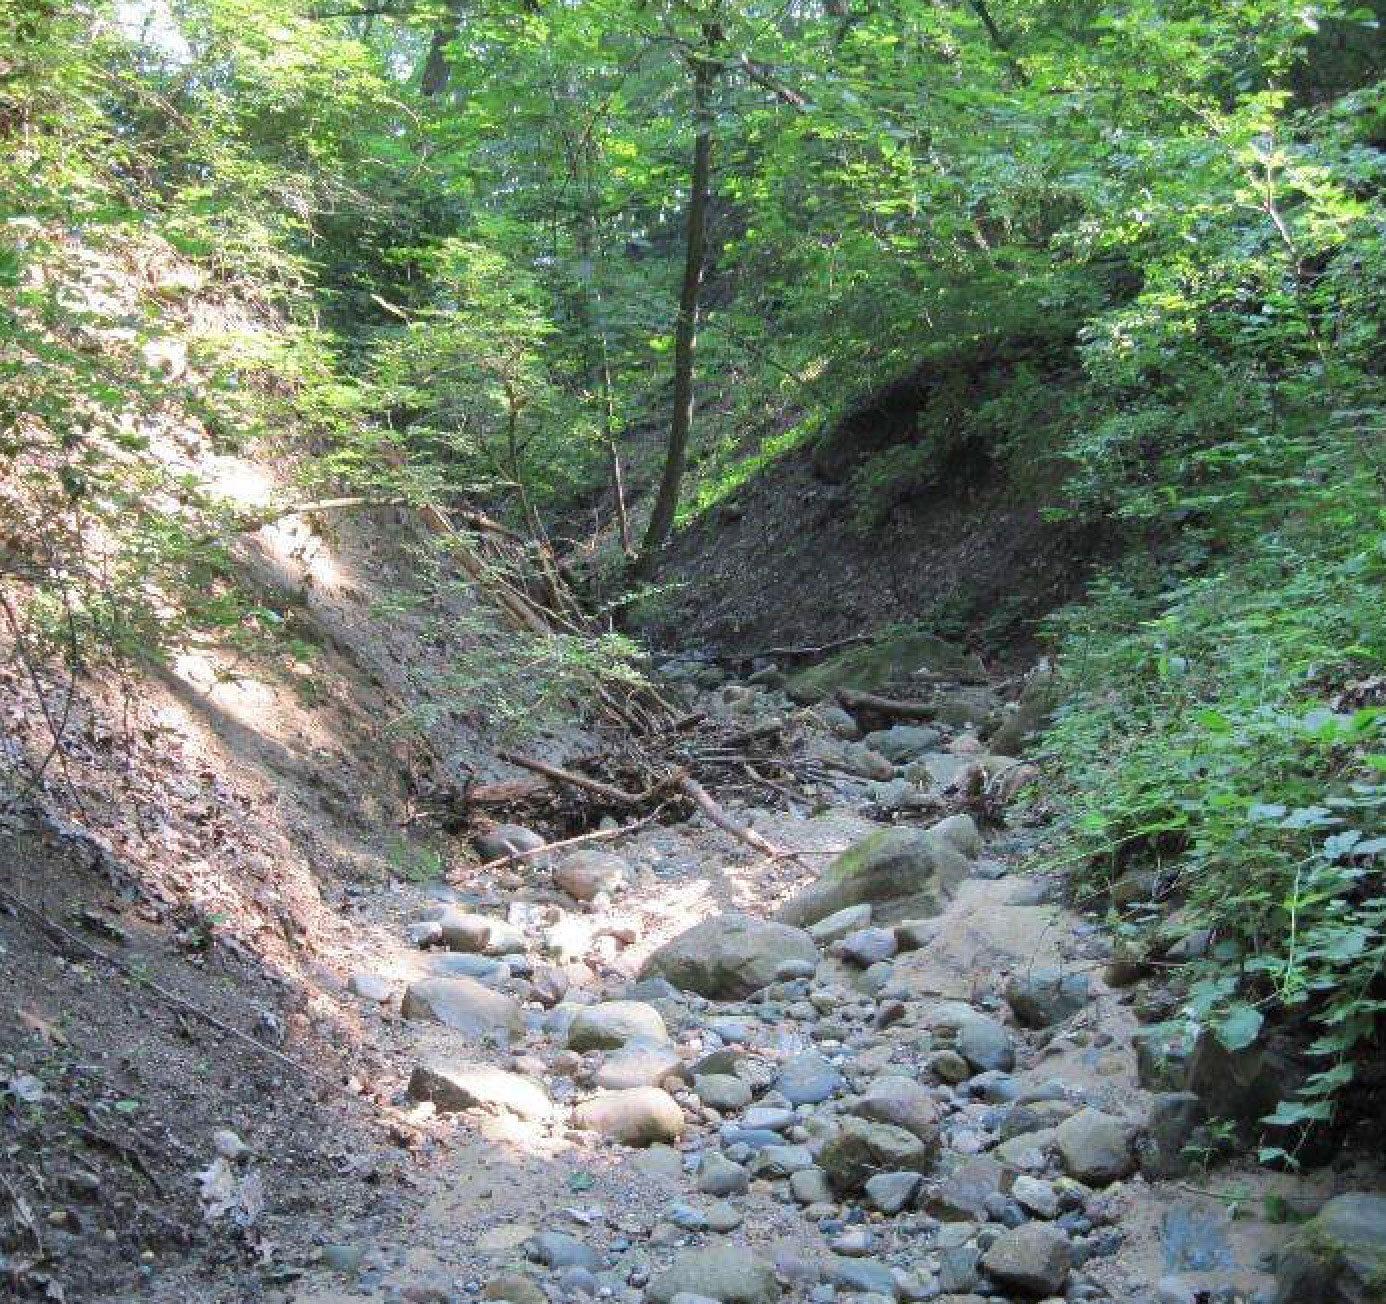 Erosion rocks & invasives in Glen